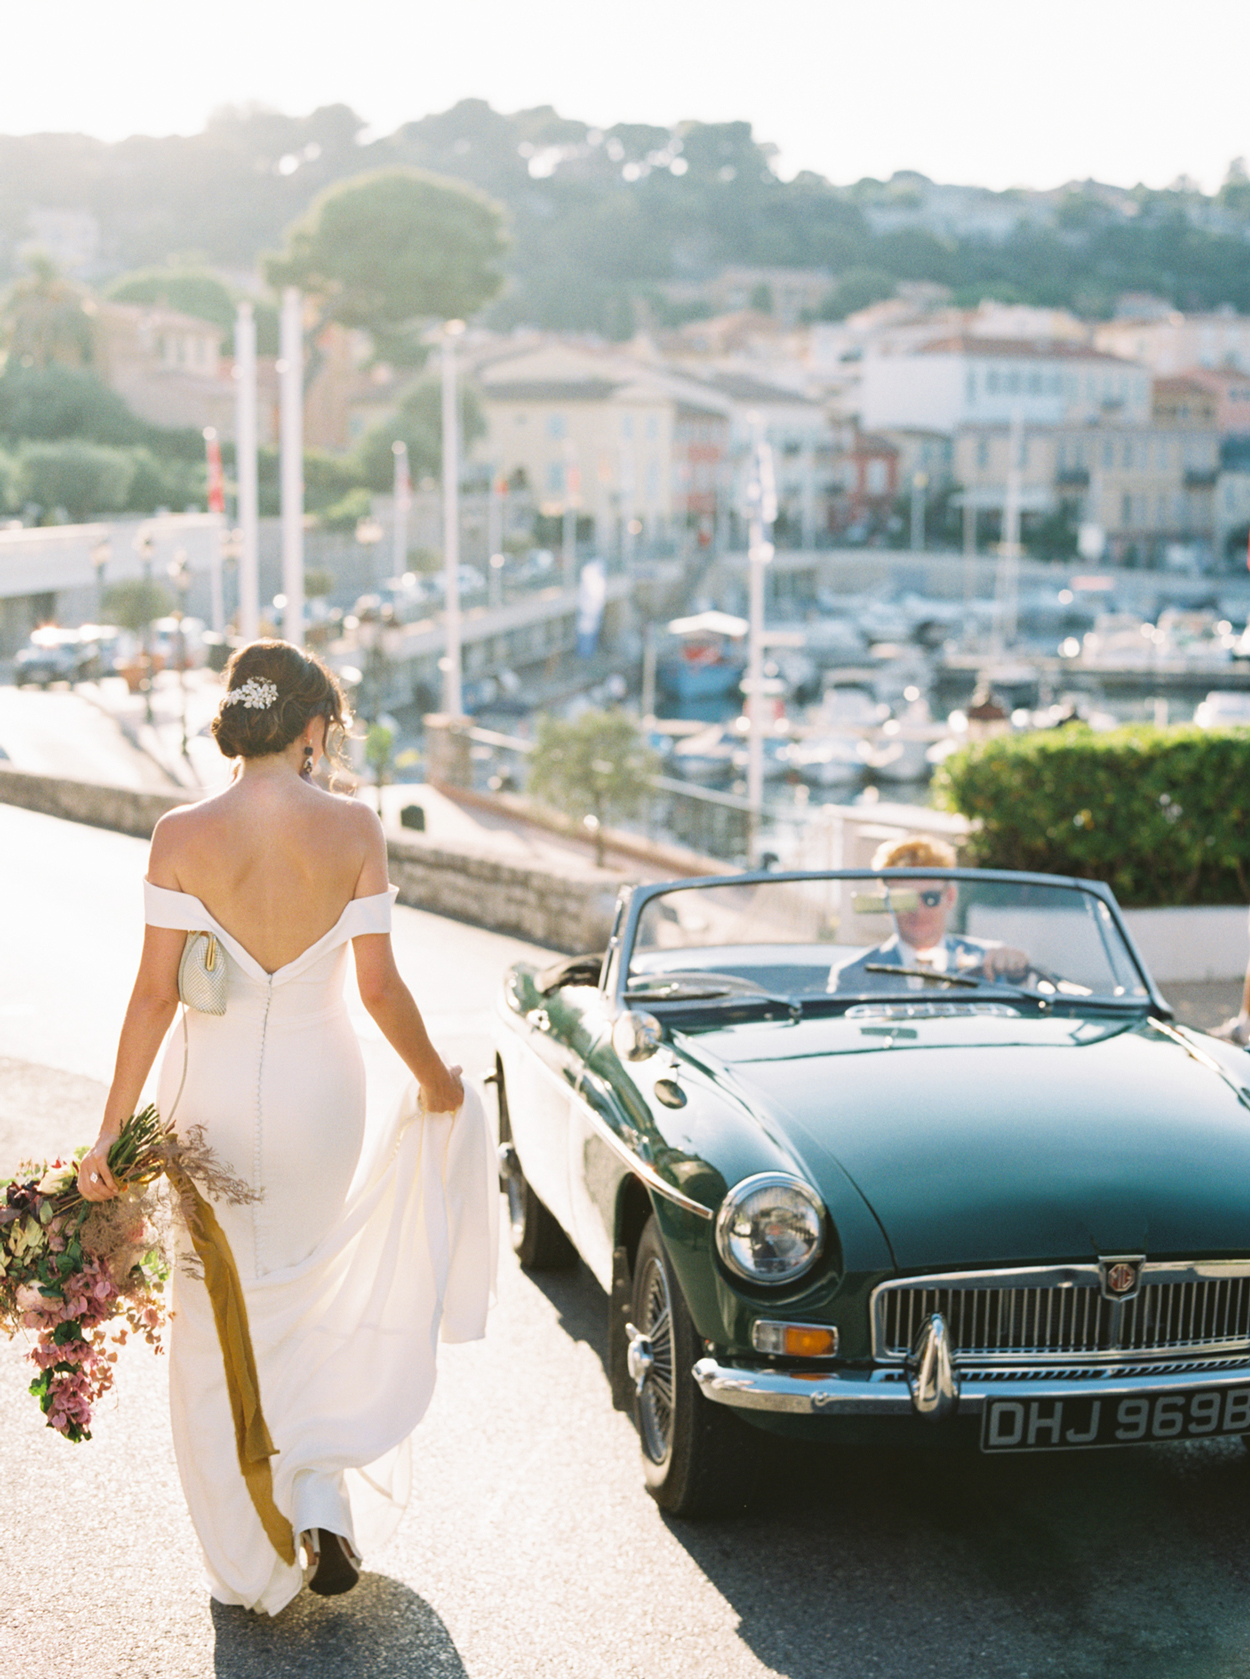 bride wearing Phoebe by Kelly Faetanini next to vintage car